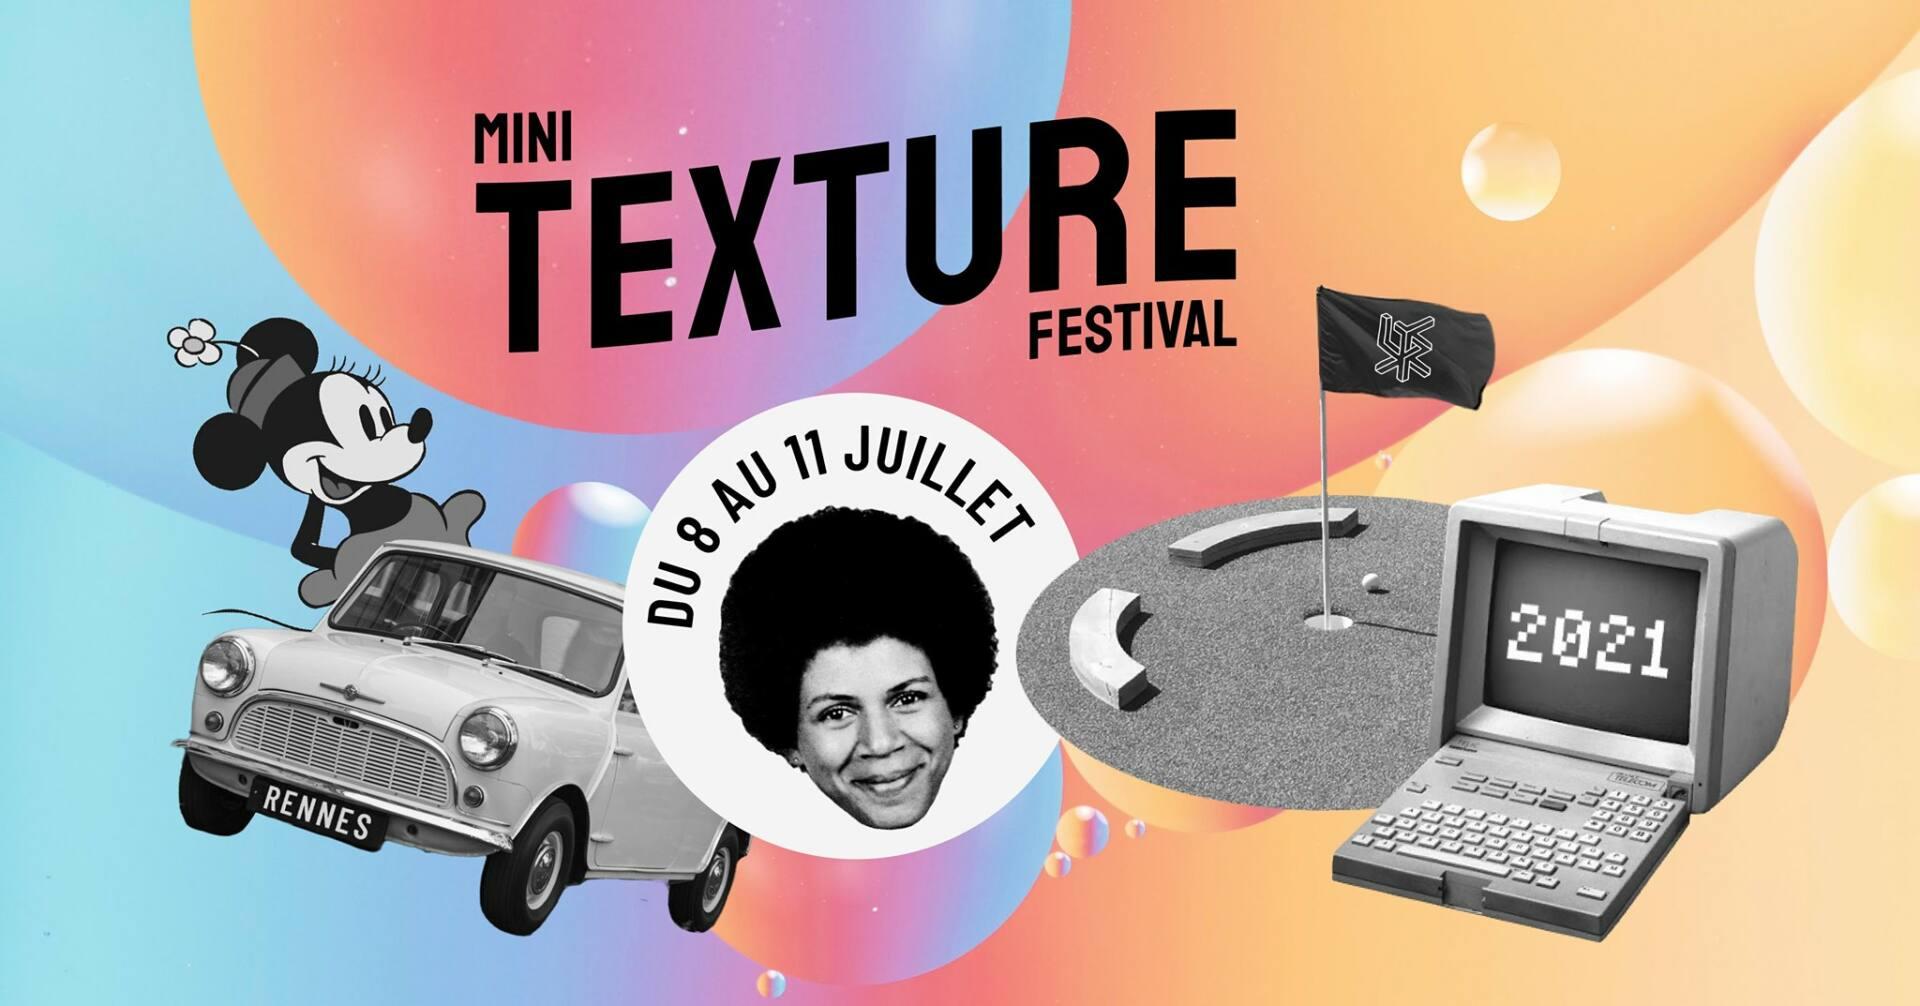 mini texture festival